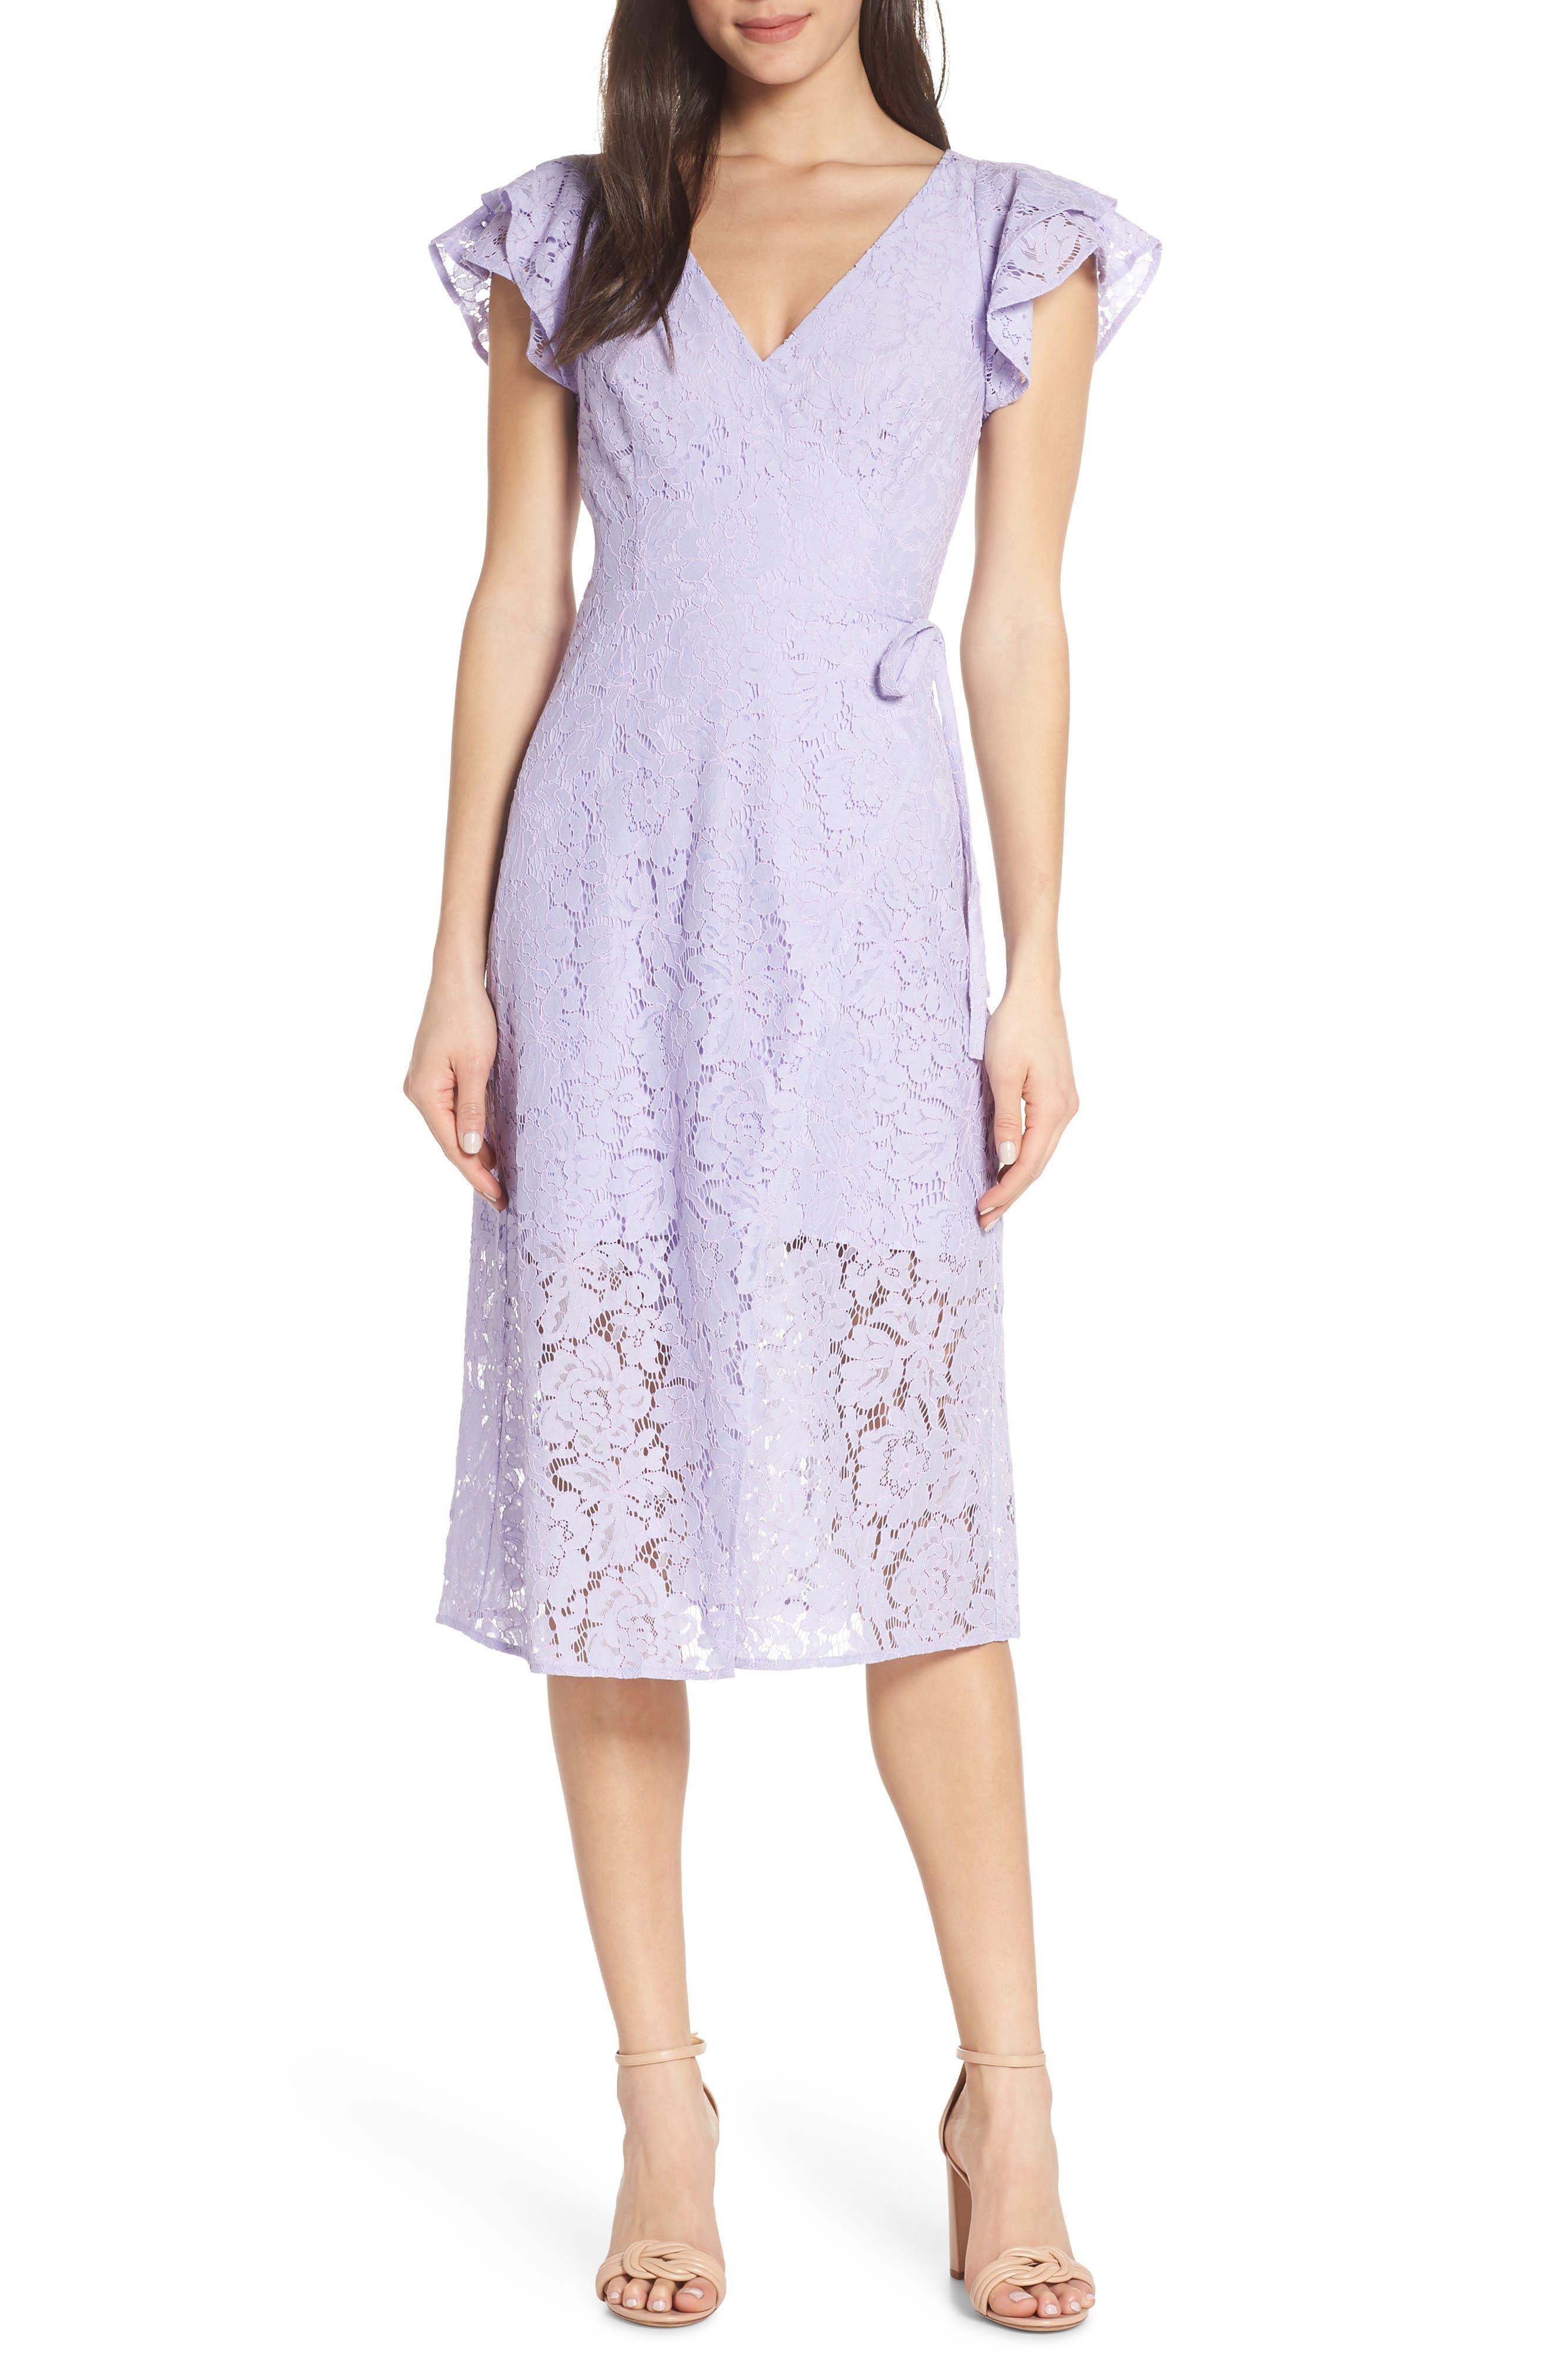 ALI & JAY, Ruffle Sleeve Wrap Lace Midi Dress, Main thumbnail 1, color, LAVENDER